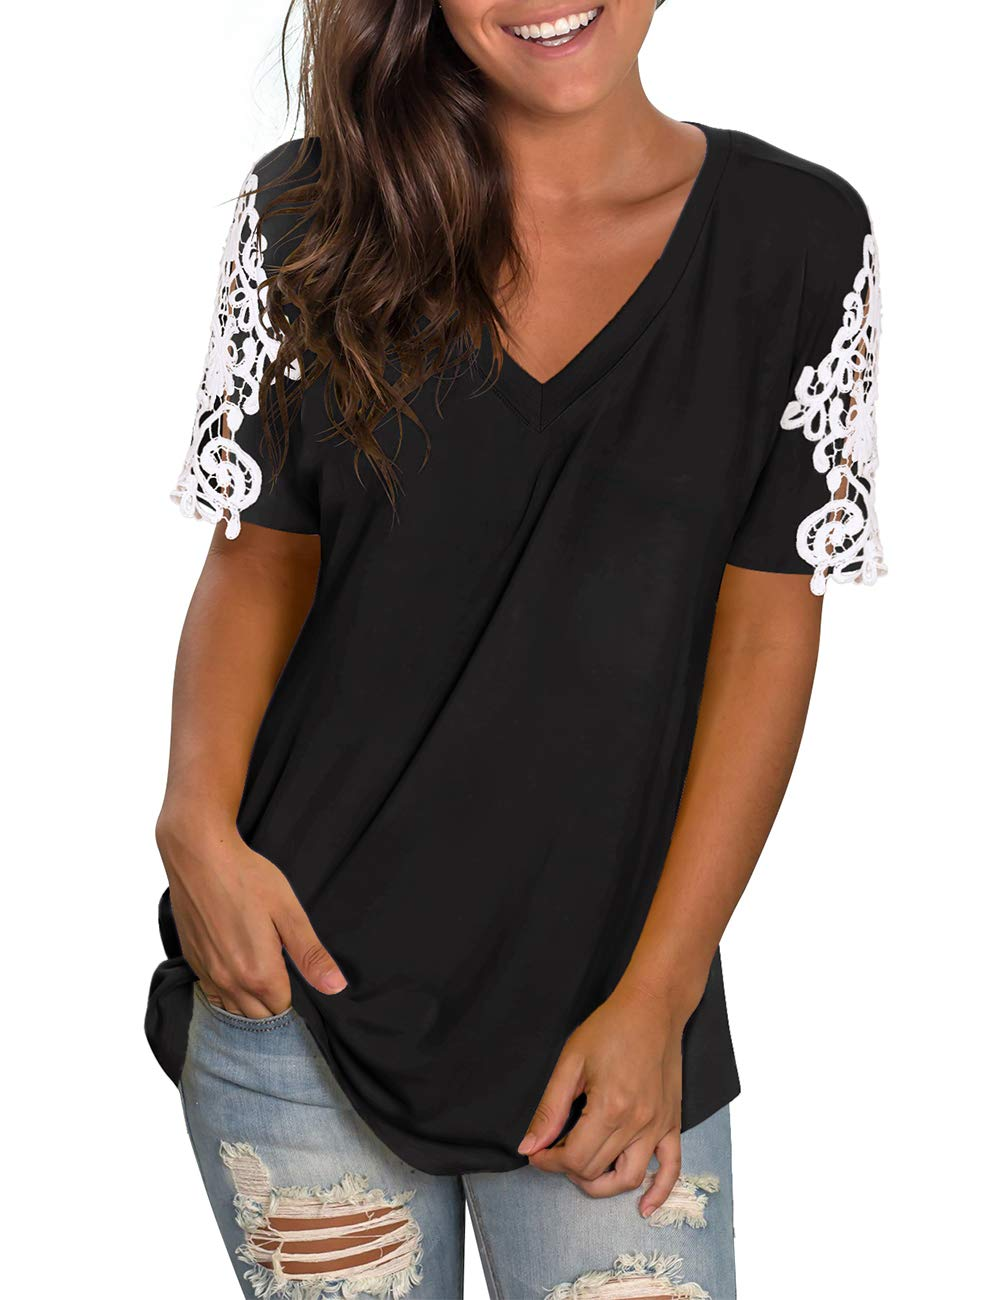 NIASHOT Womens Shirts V Neck Short Sleeve Lace Tunics Casual Loose Tops